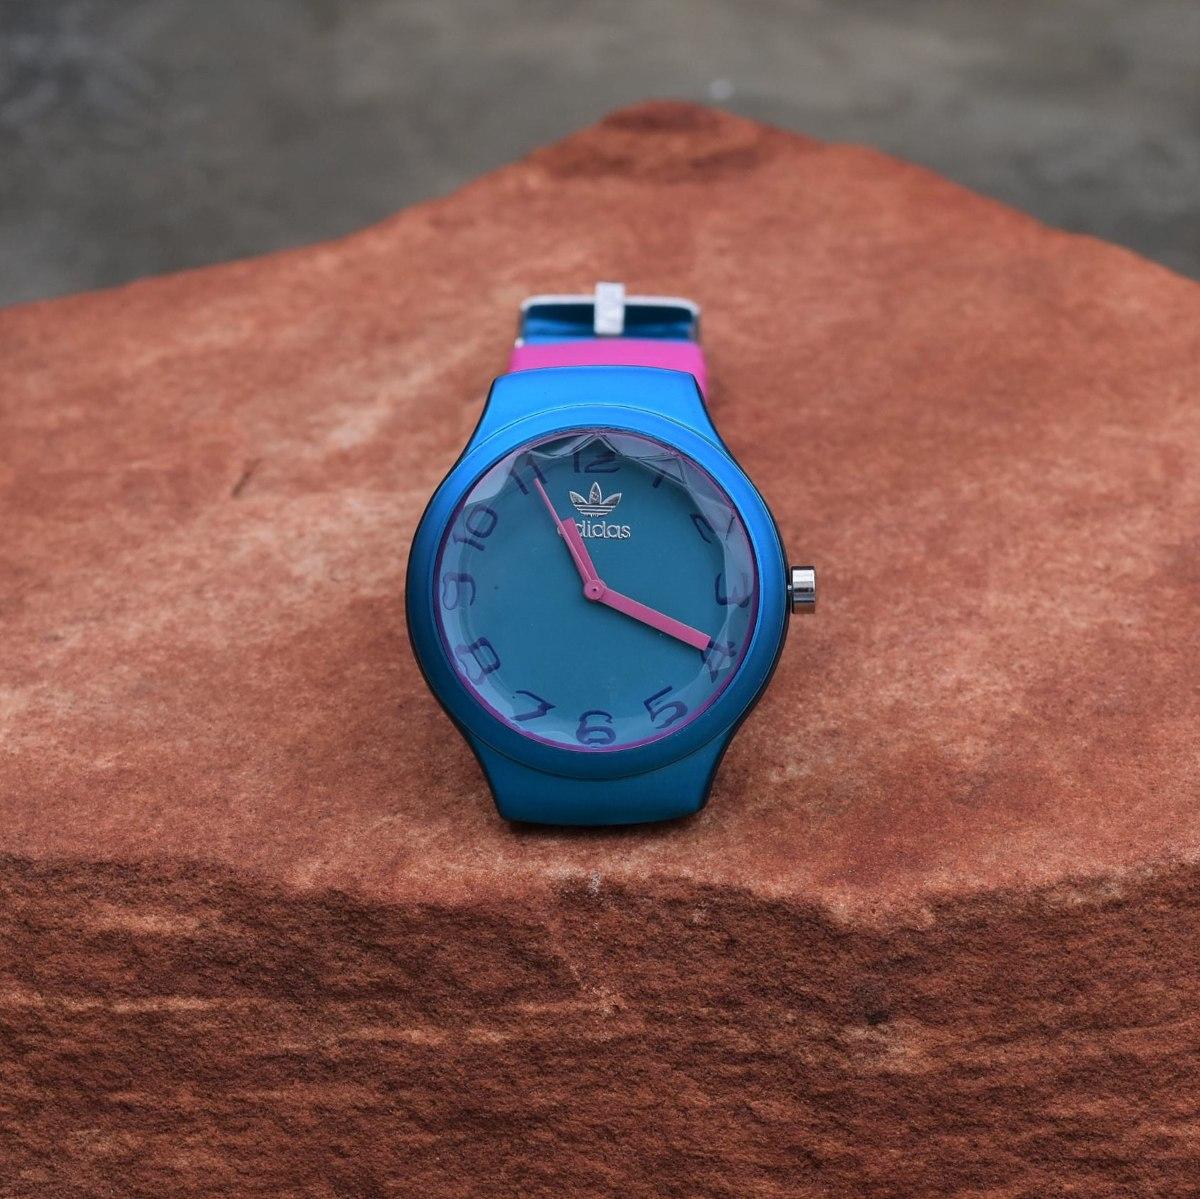 8d64fcb3cee relogio feminino analogico pulseira borracha azul e lilas ad. Carregando  zoom.